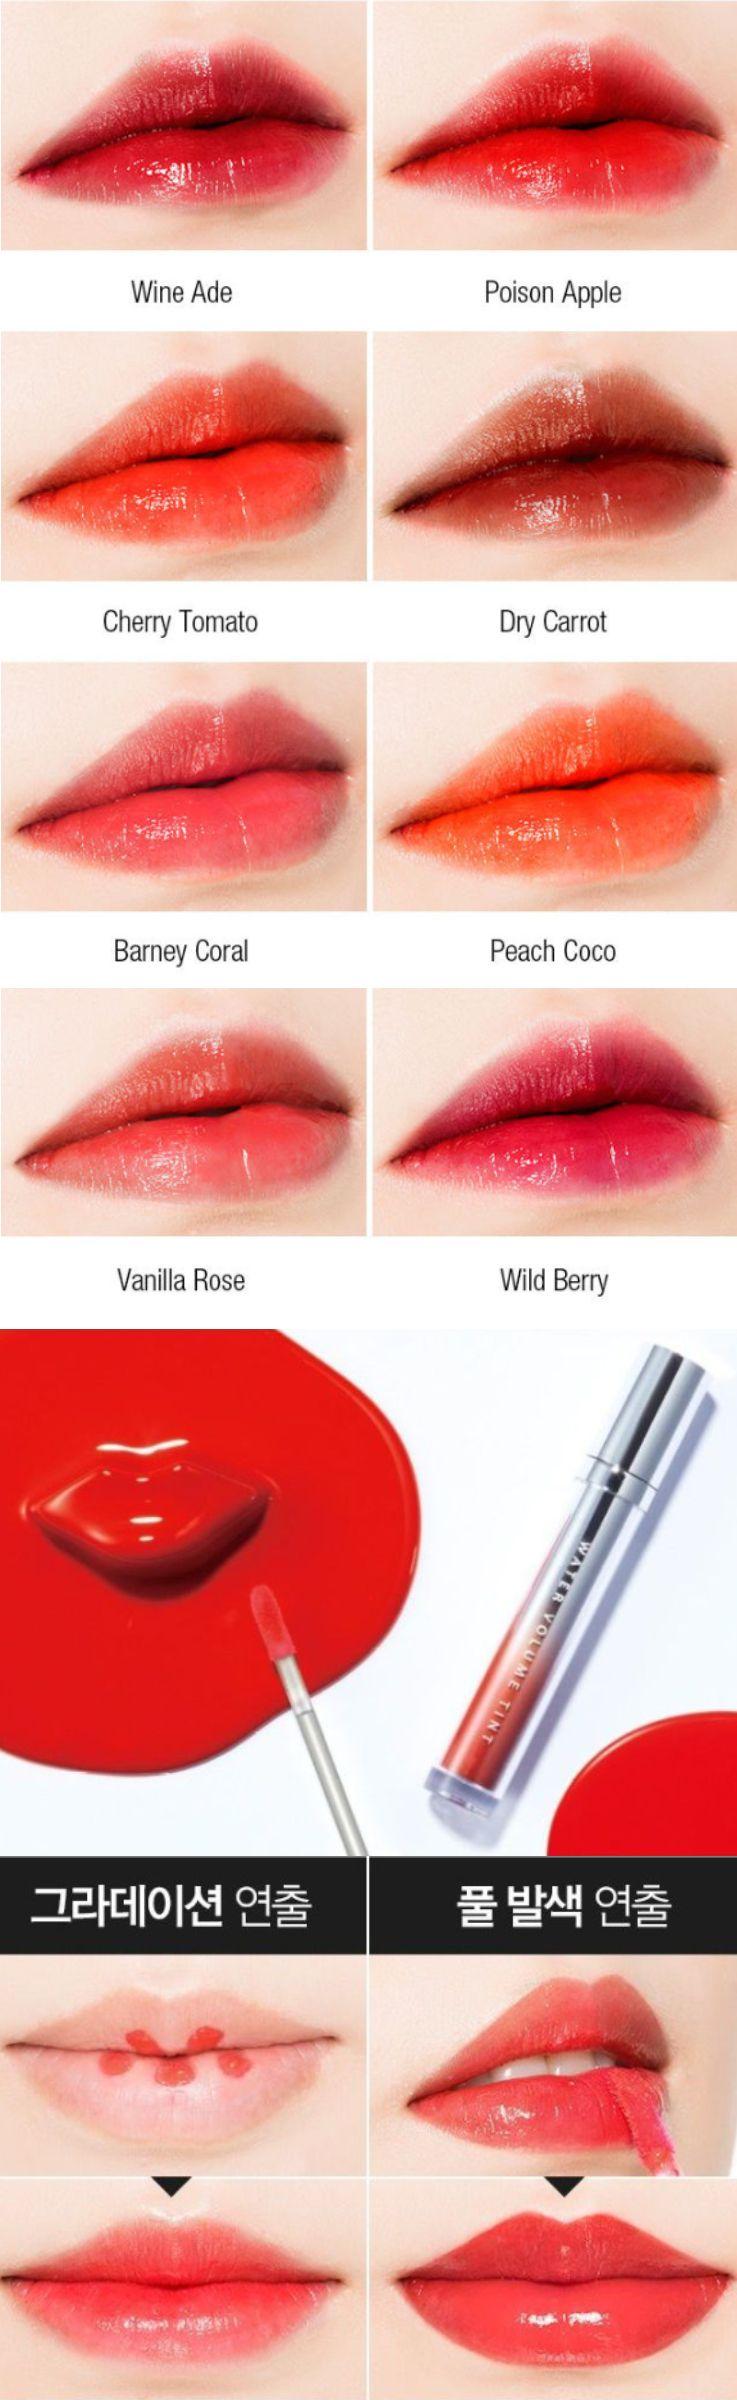 Missha Water Volume Tint 10 Colors Yesstyle Subtle Makeup Round Face Makeup Makeup